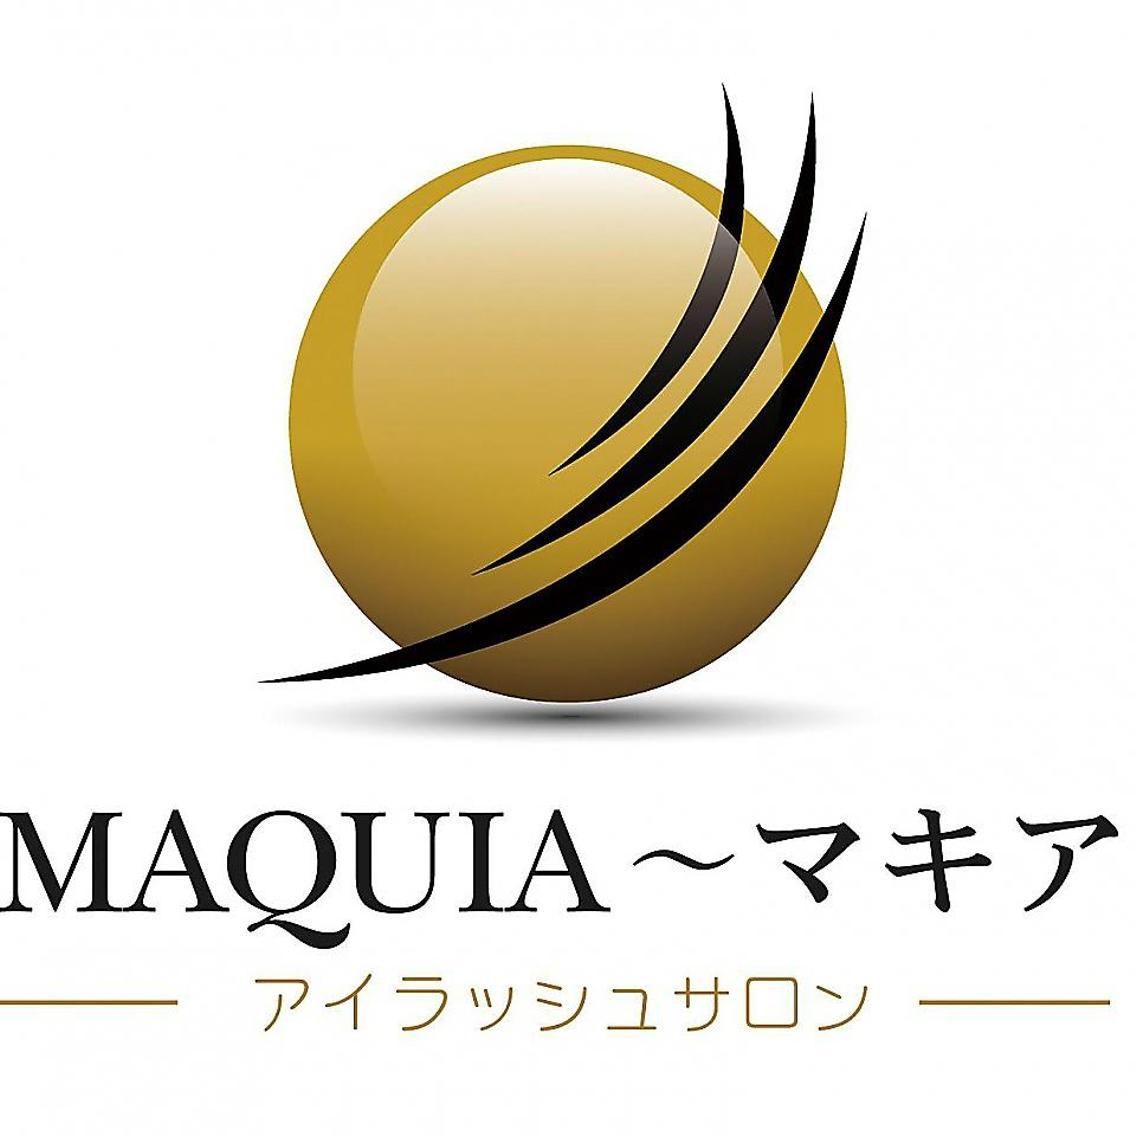 MAQUIA福島駅前店所属・MAQUIA福島駅前 上野の掲載